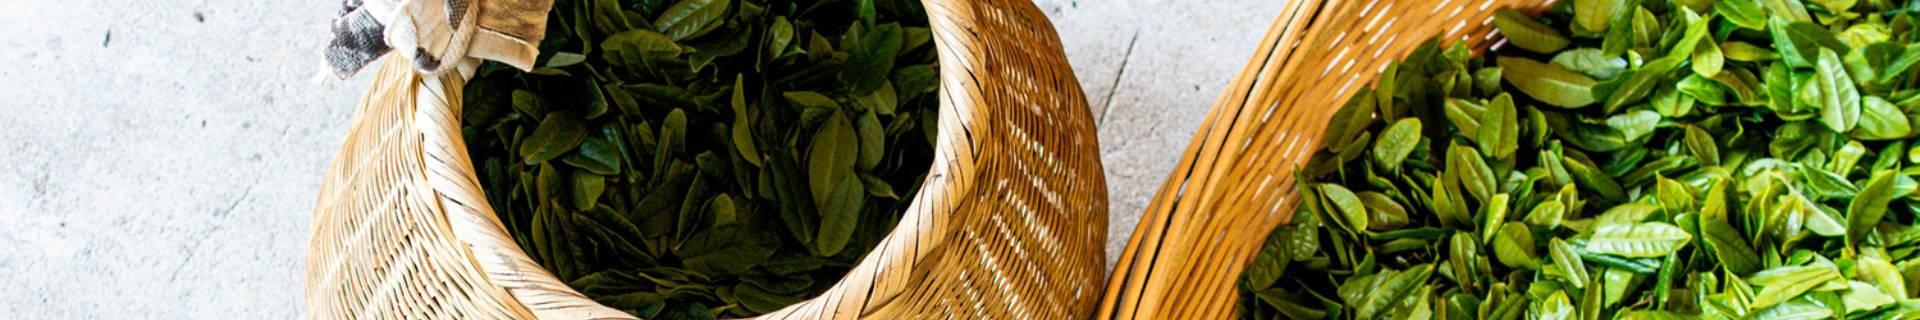 Organic Oolong Tea - ECOLECTIA